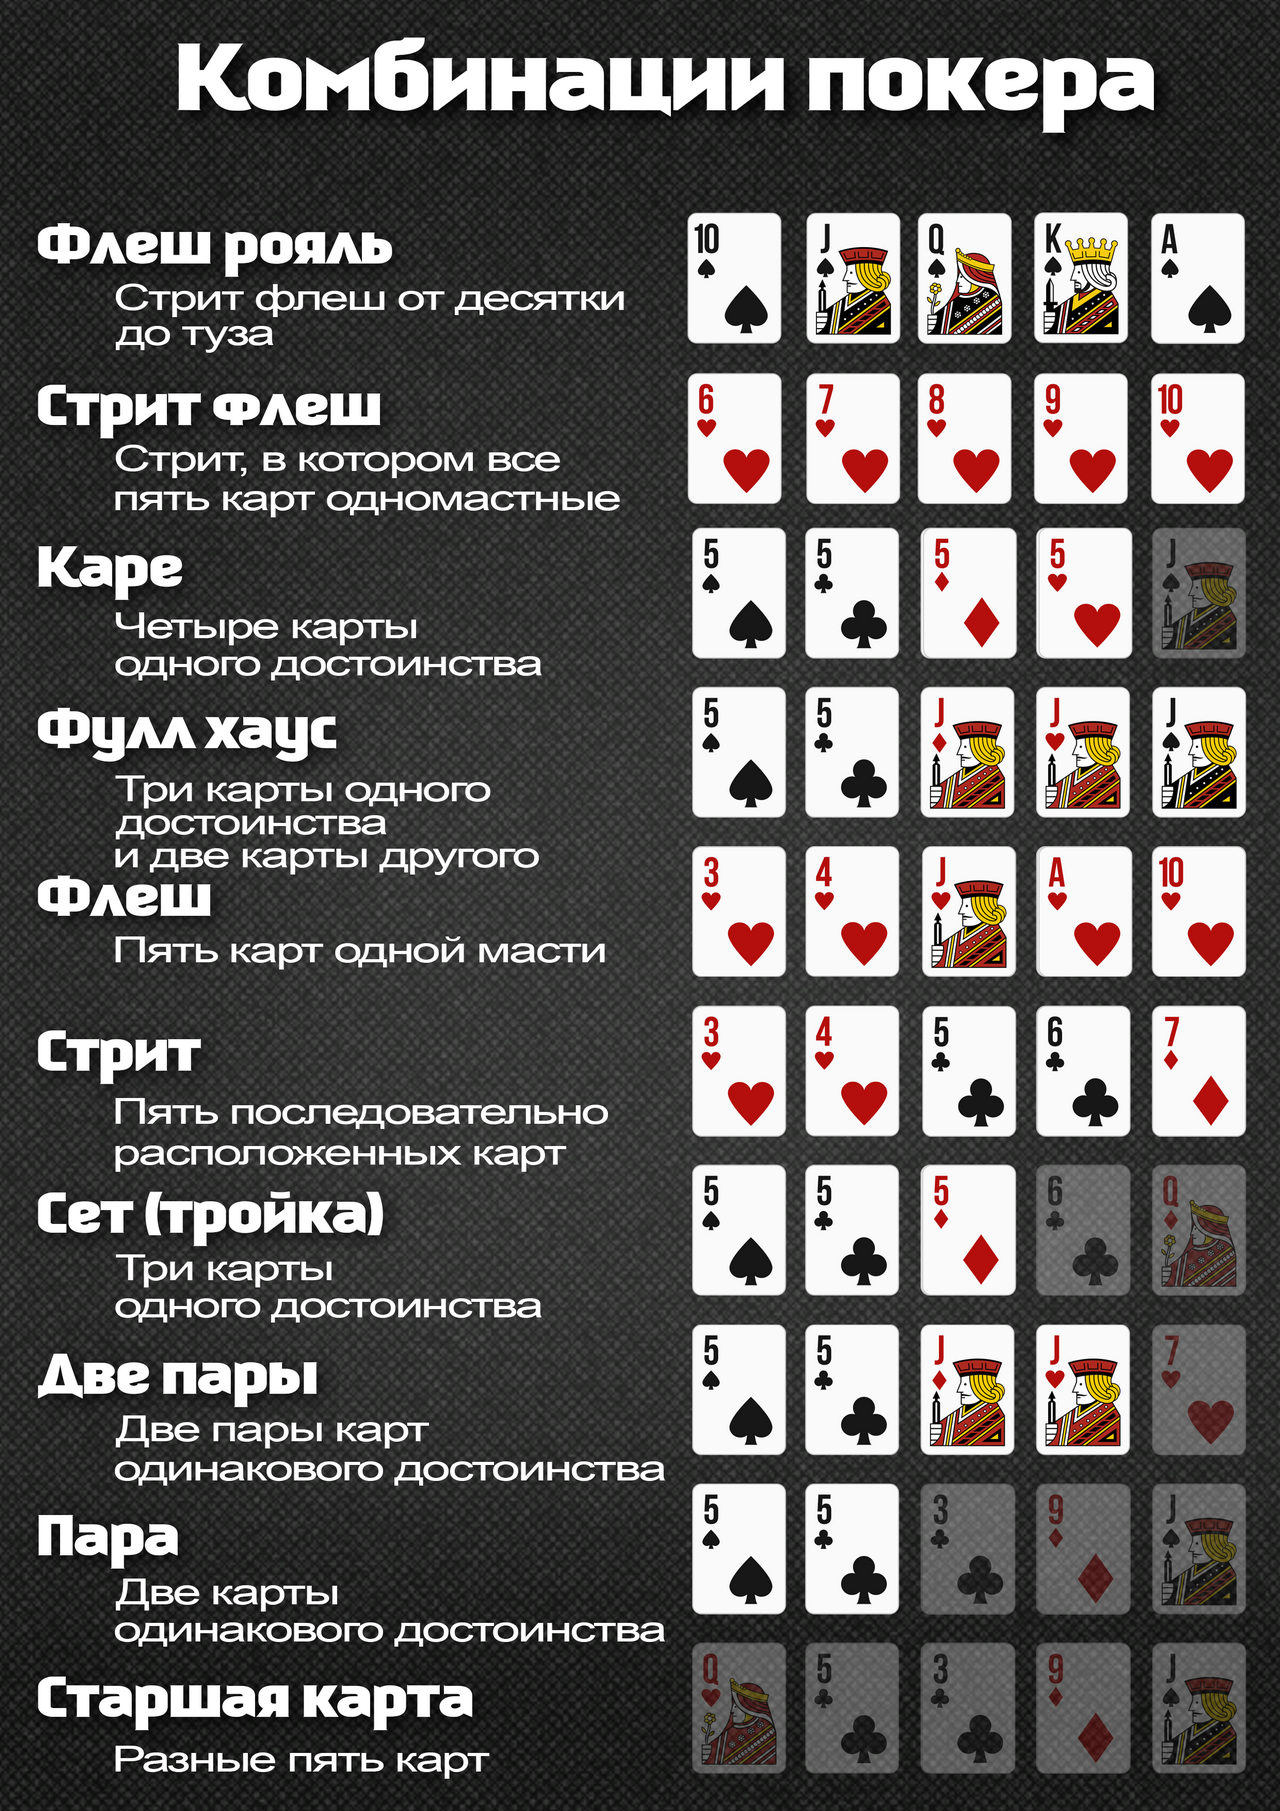 покер правила игрі